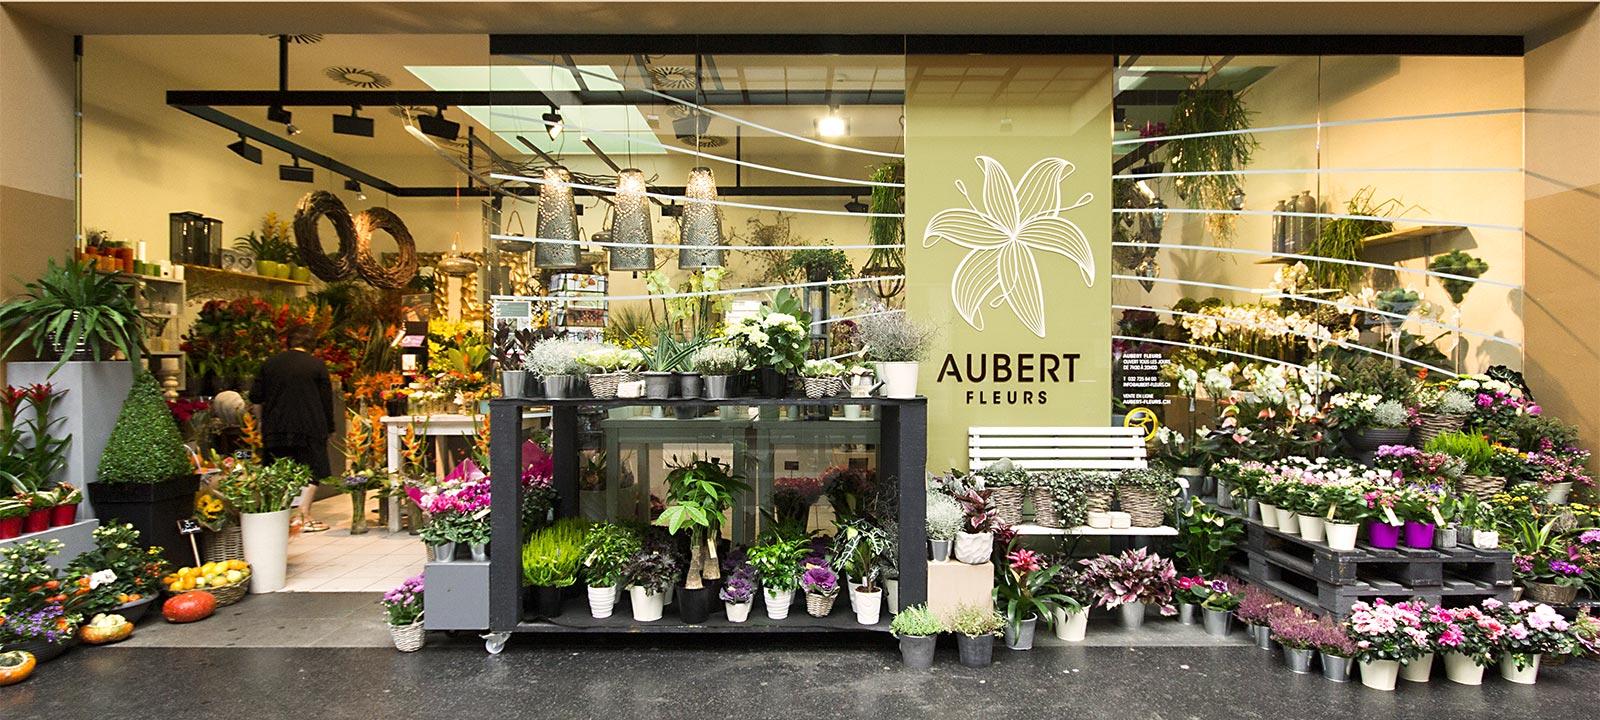 Bien-aimé Aubert Fleurs UL73